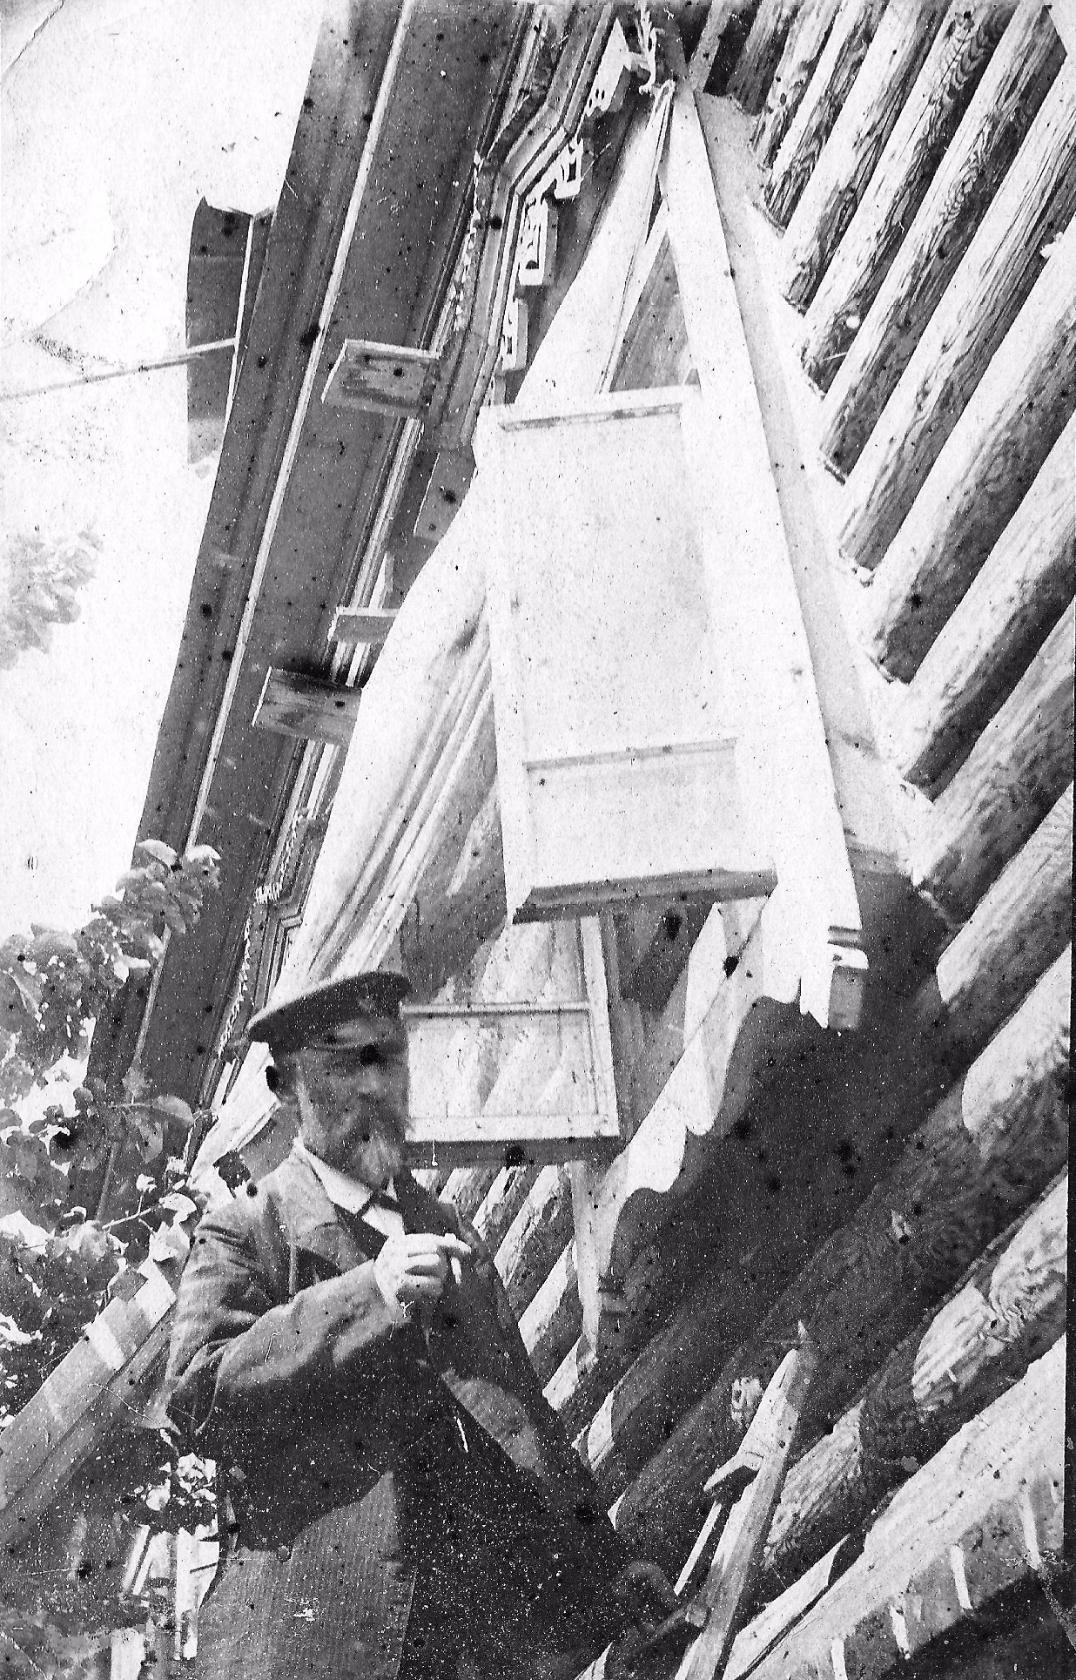 Петр Иванович Горбунов возле своего дома